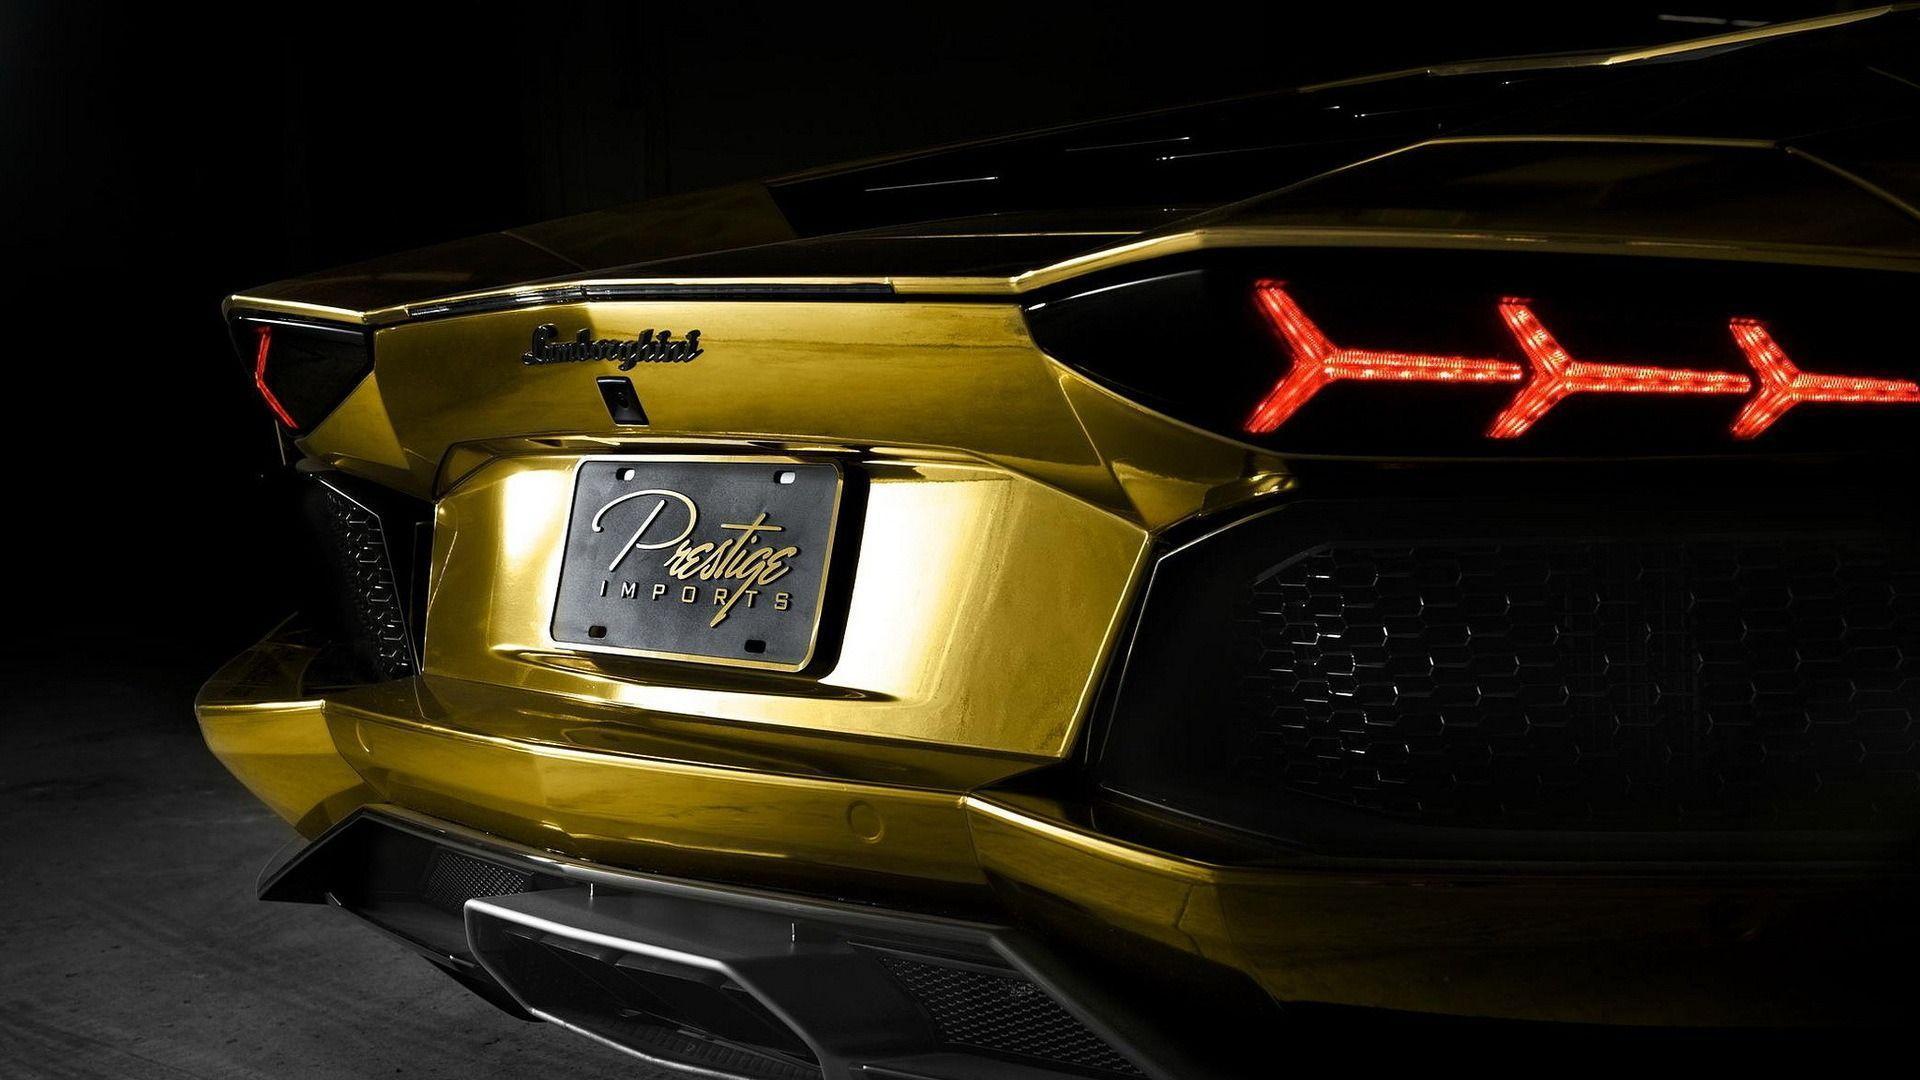 Wallpapers Full HD 1080p Lamborghini New 2017 - Wallpaper Cave